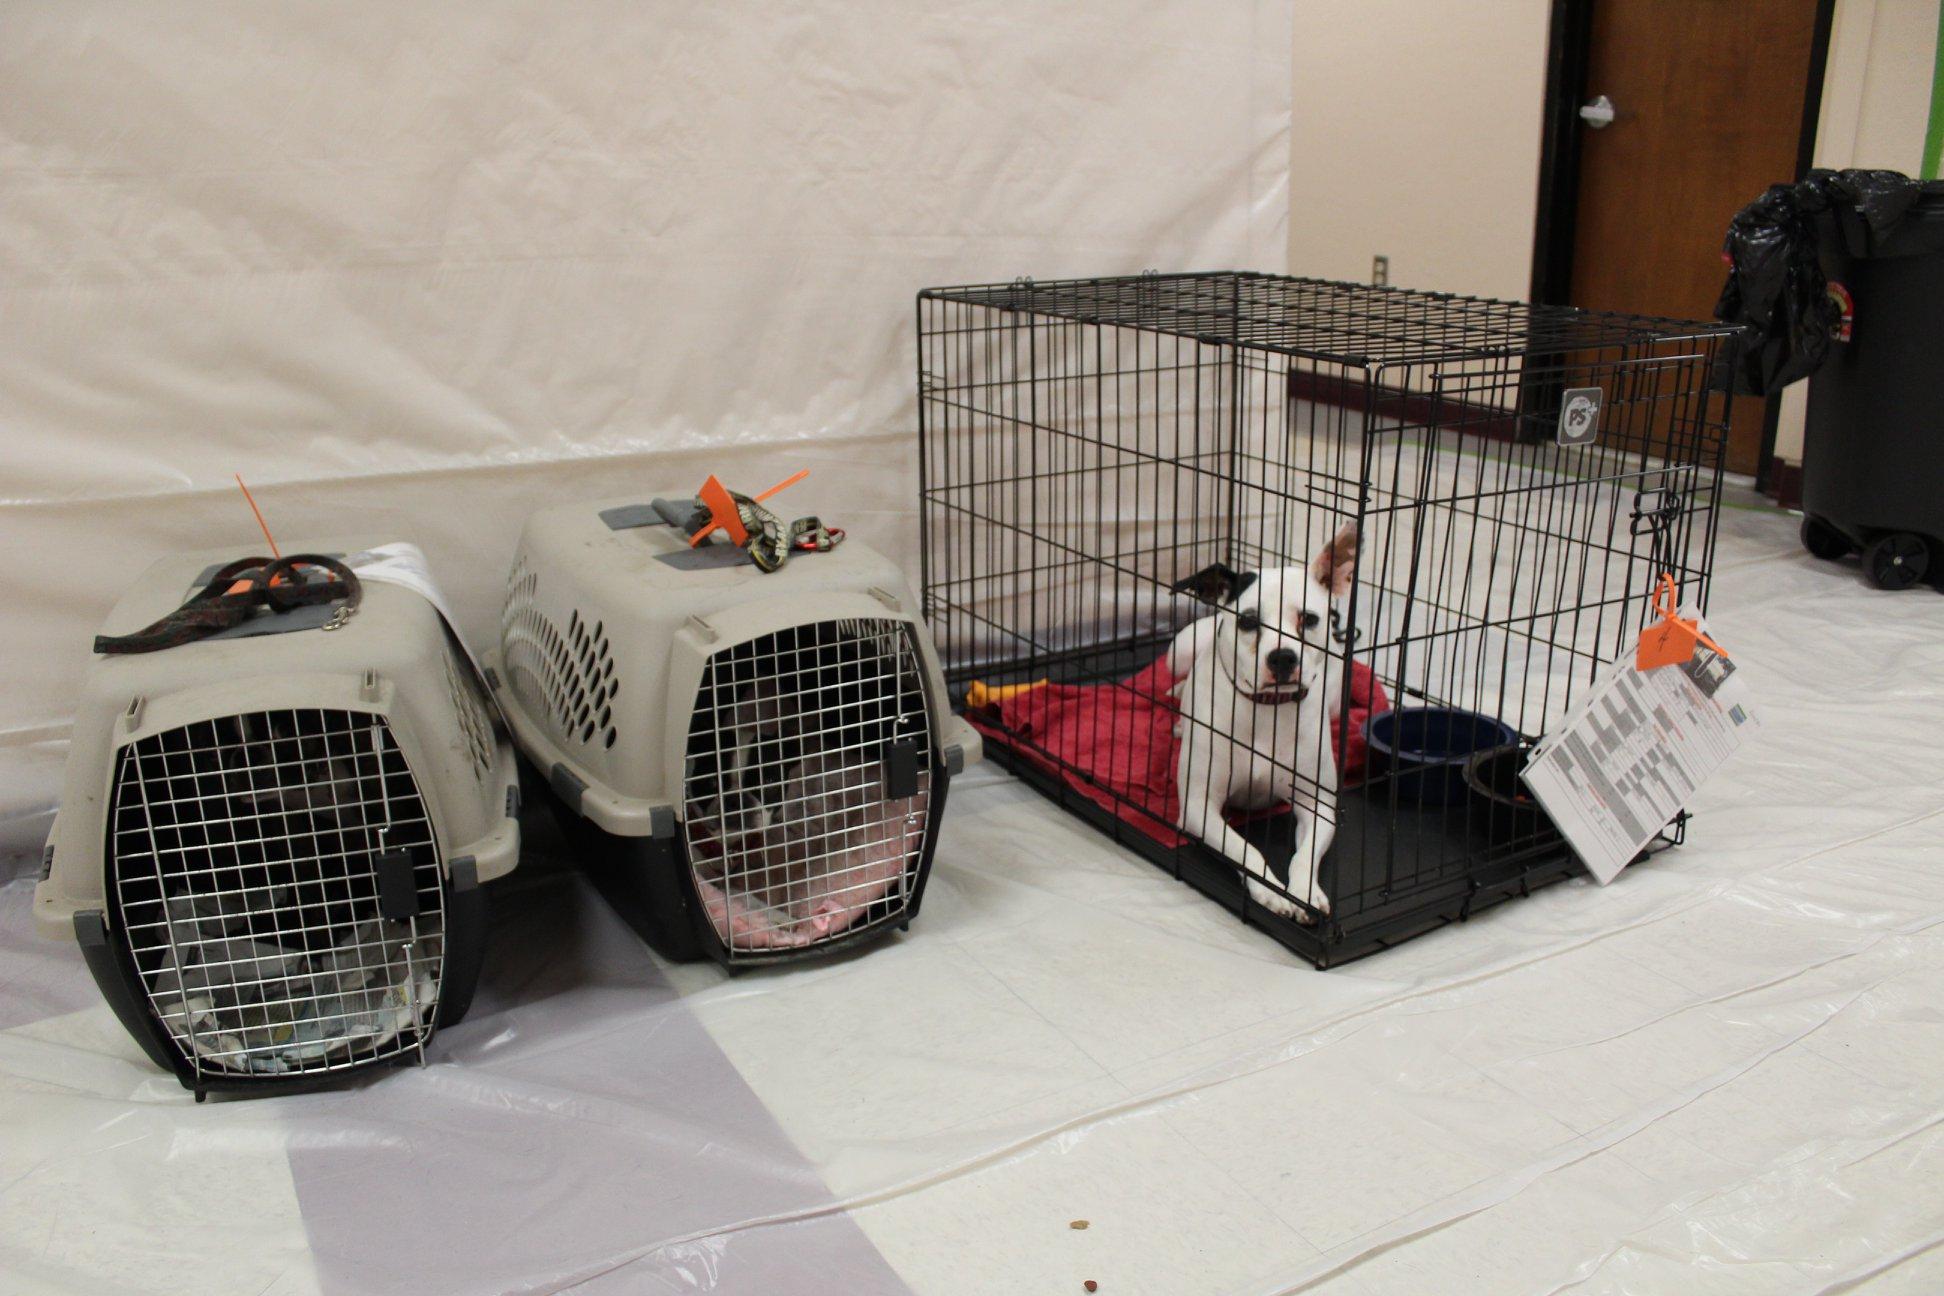 Pre-register pets at St. Lucie Pet Friendly Shelter